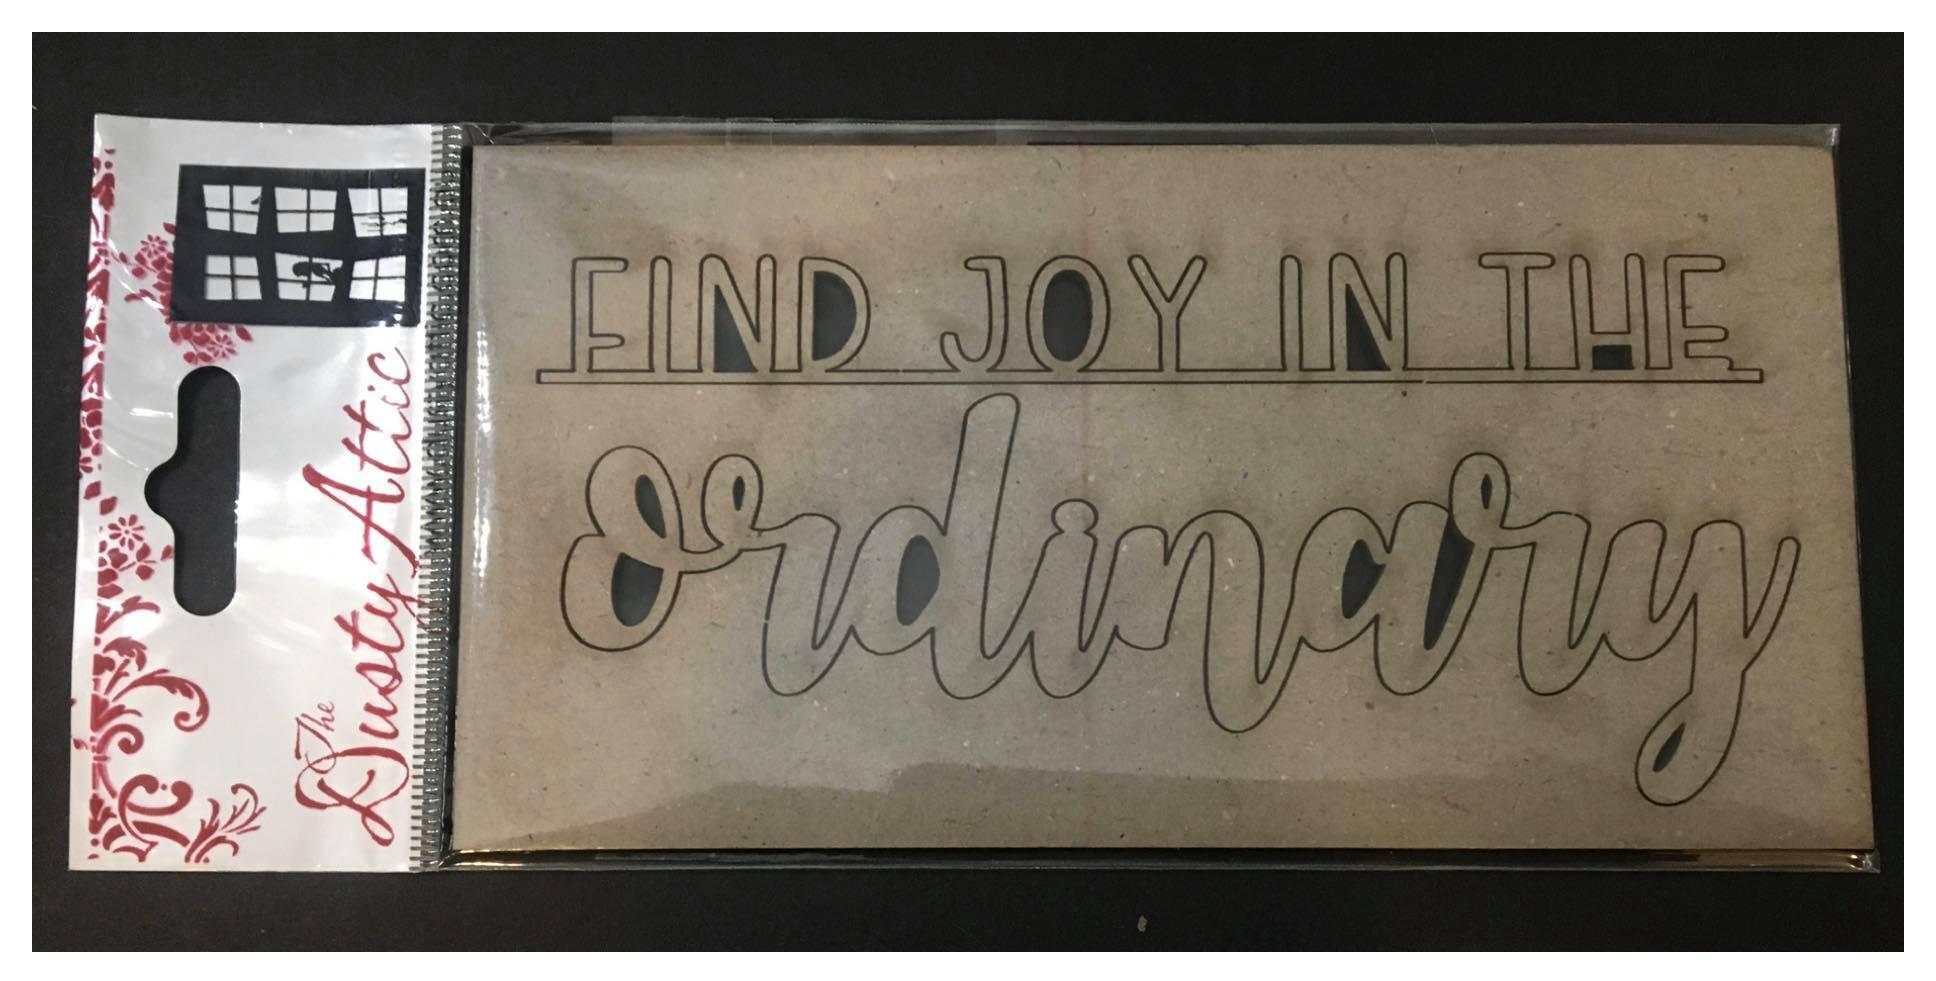 Dusty Attic Chipboard - Find Joy In The Ordinary